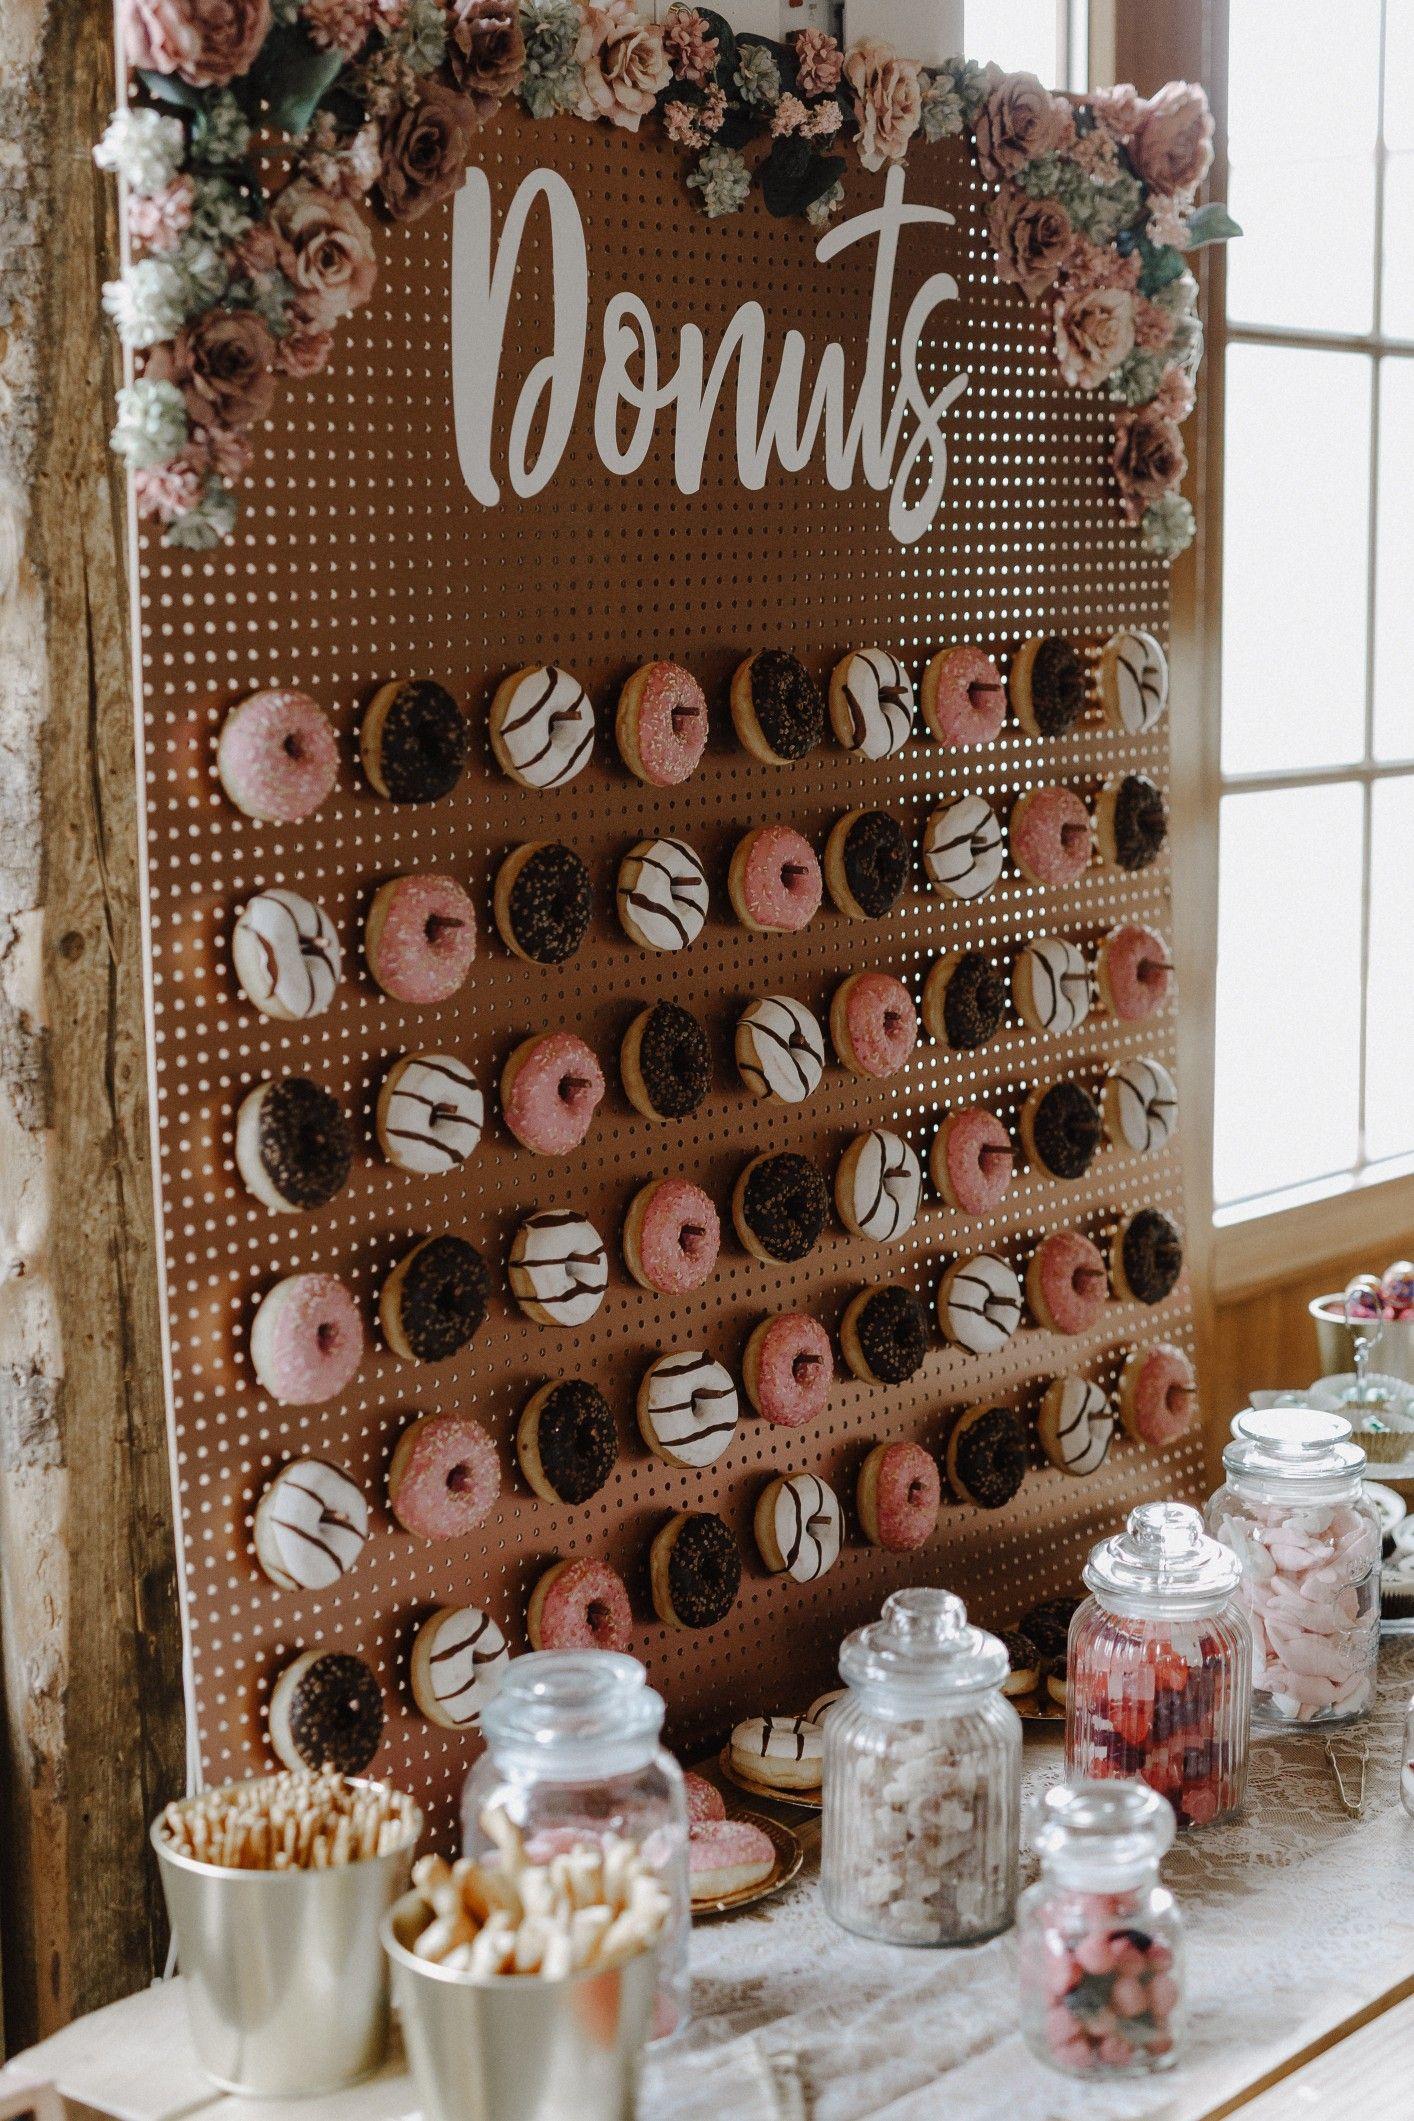 Boho Wedding Boho Hochzeit Candy Bar Donut Wall Donut Wand Hochzeit Servietten Hochzeit Hochzeit